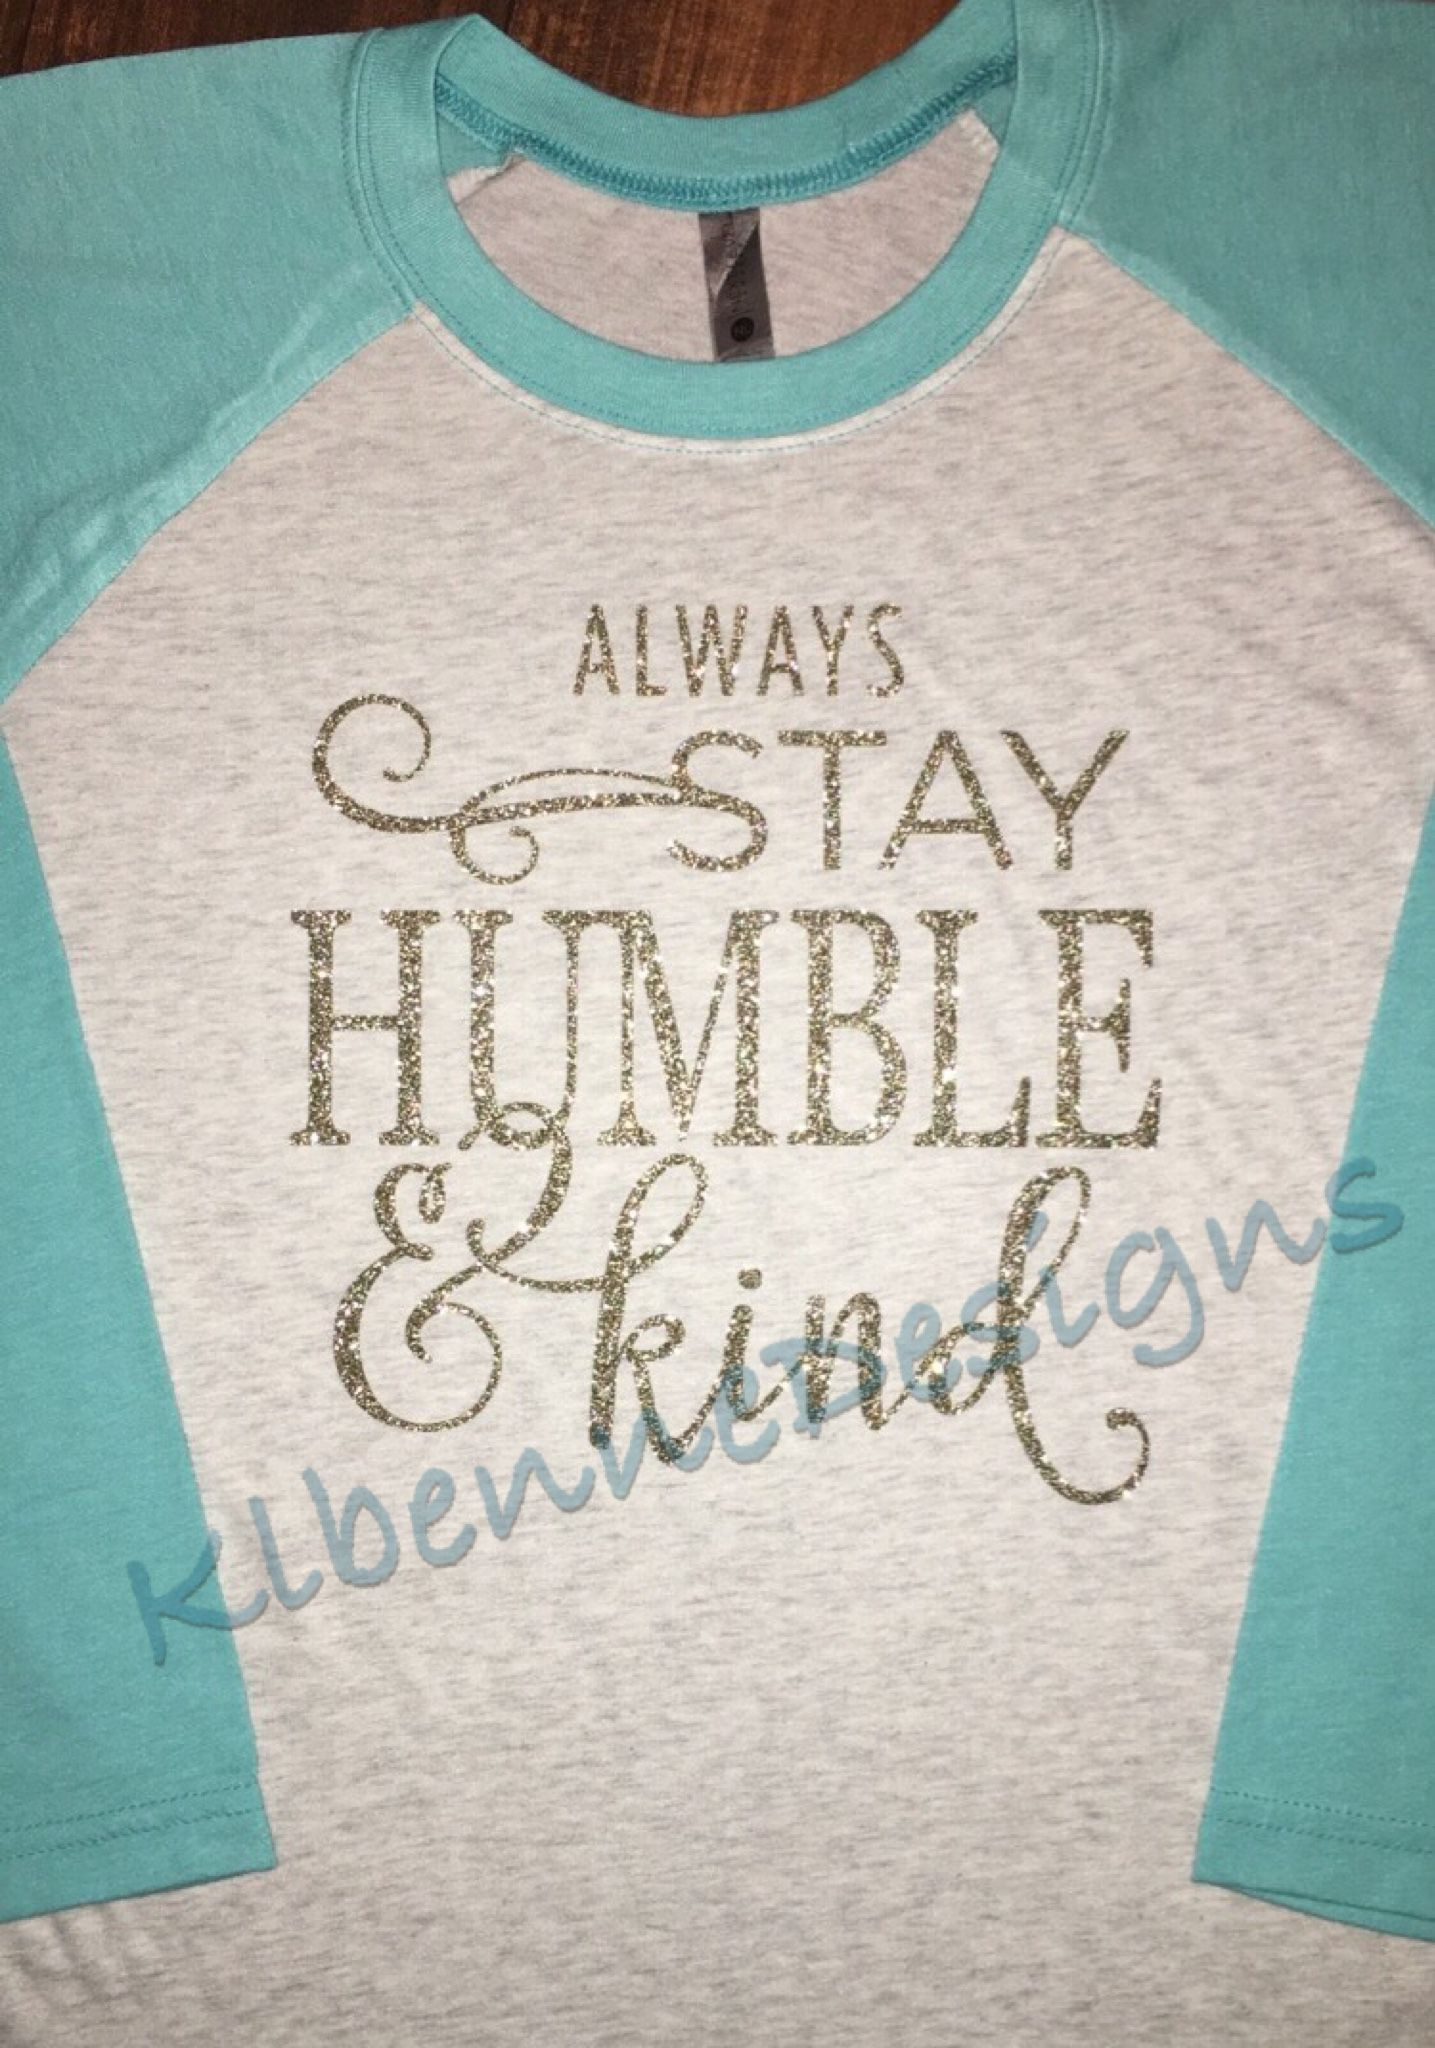 Humble Kind Glitter Htv Shirt By Klbennedesigns Htv Shirts Vinyl Shirts Htv